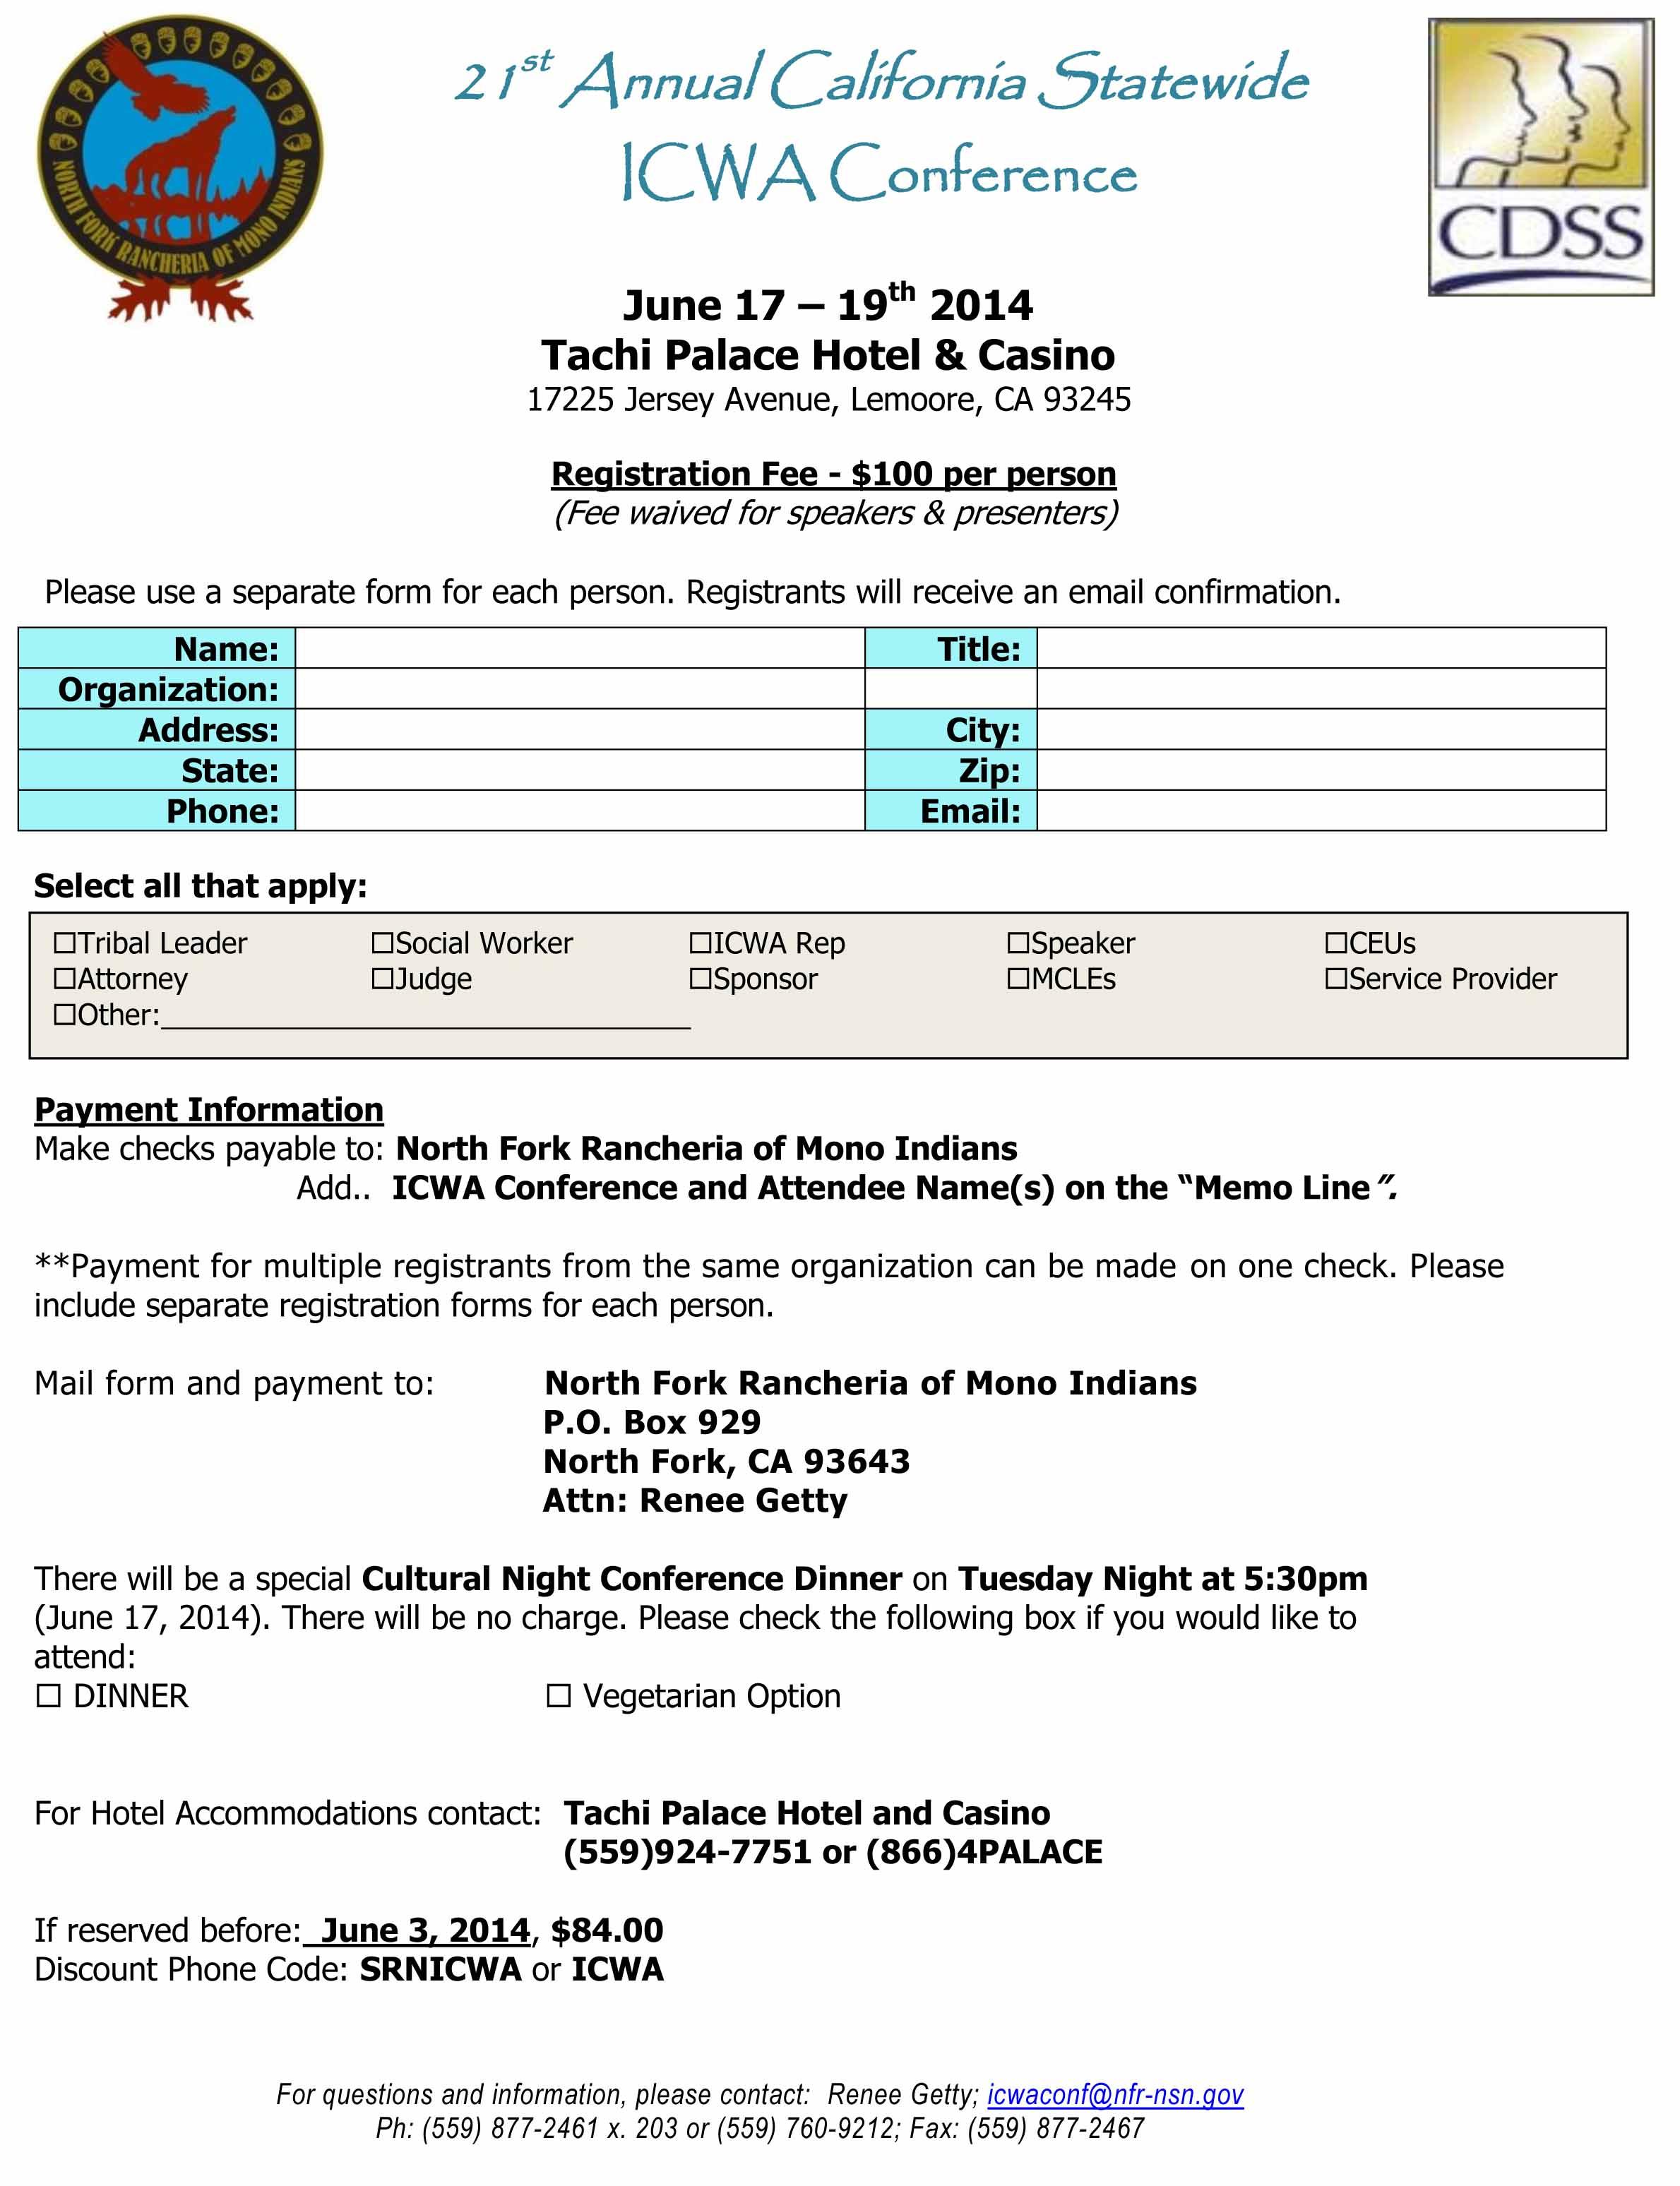 2014 ICWA Conf Reg Form